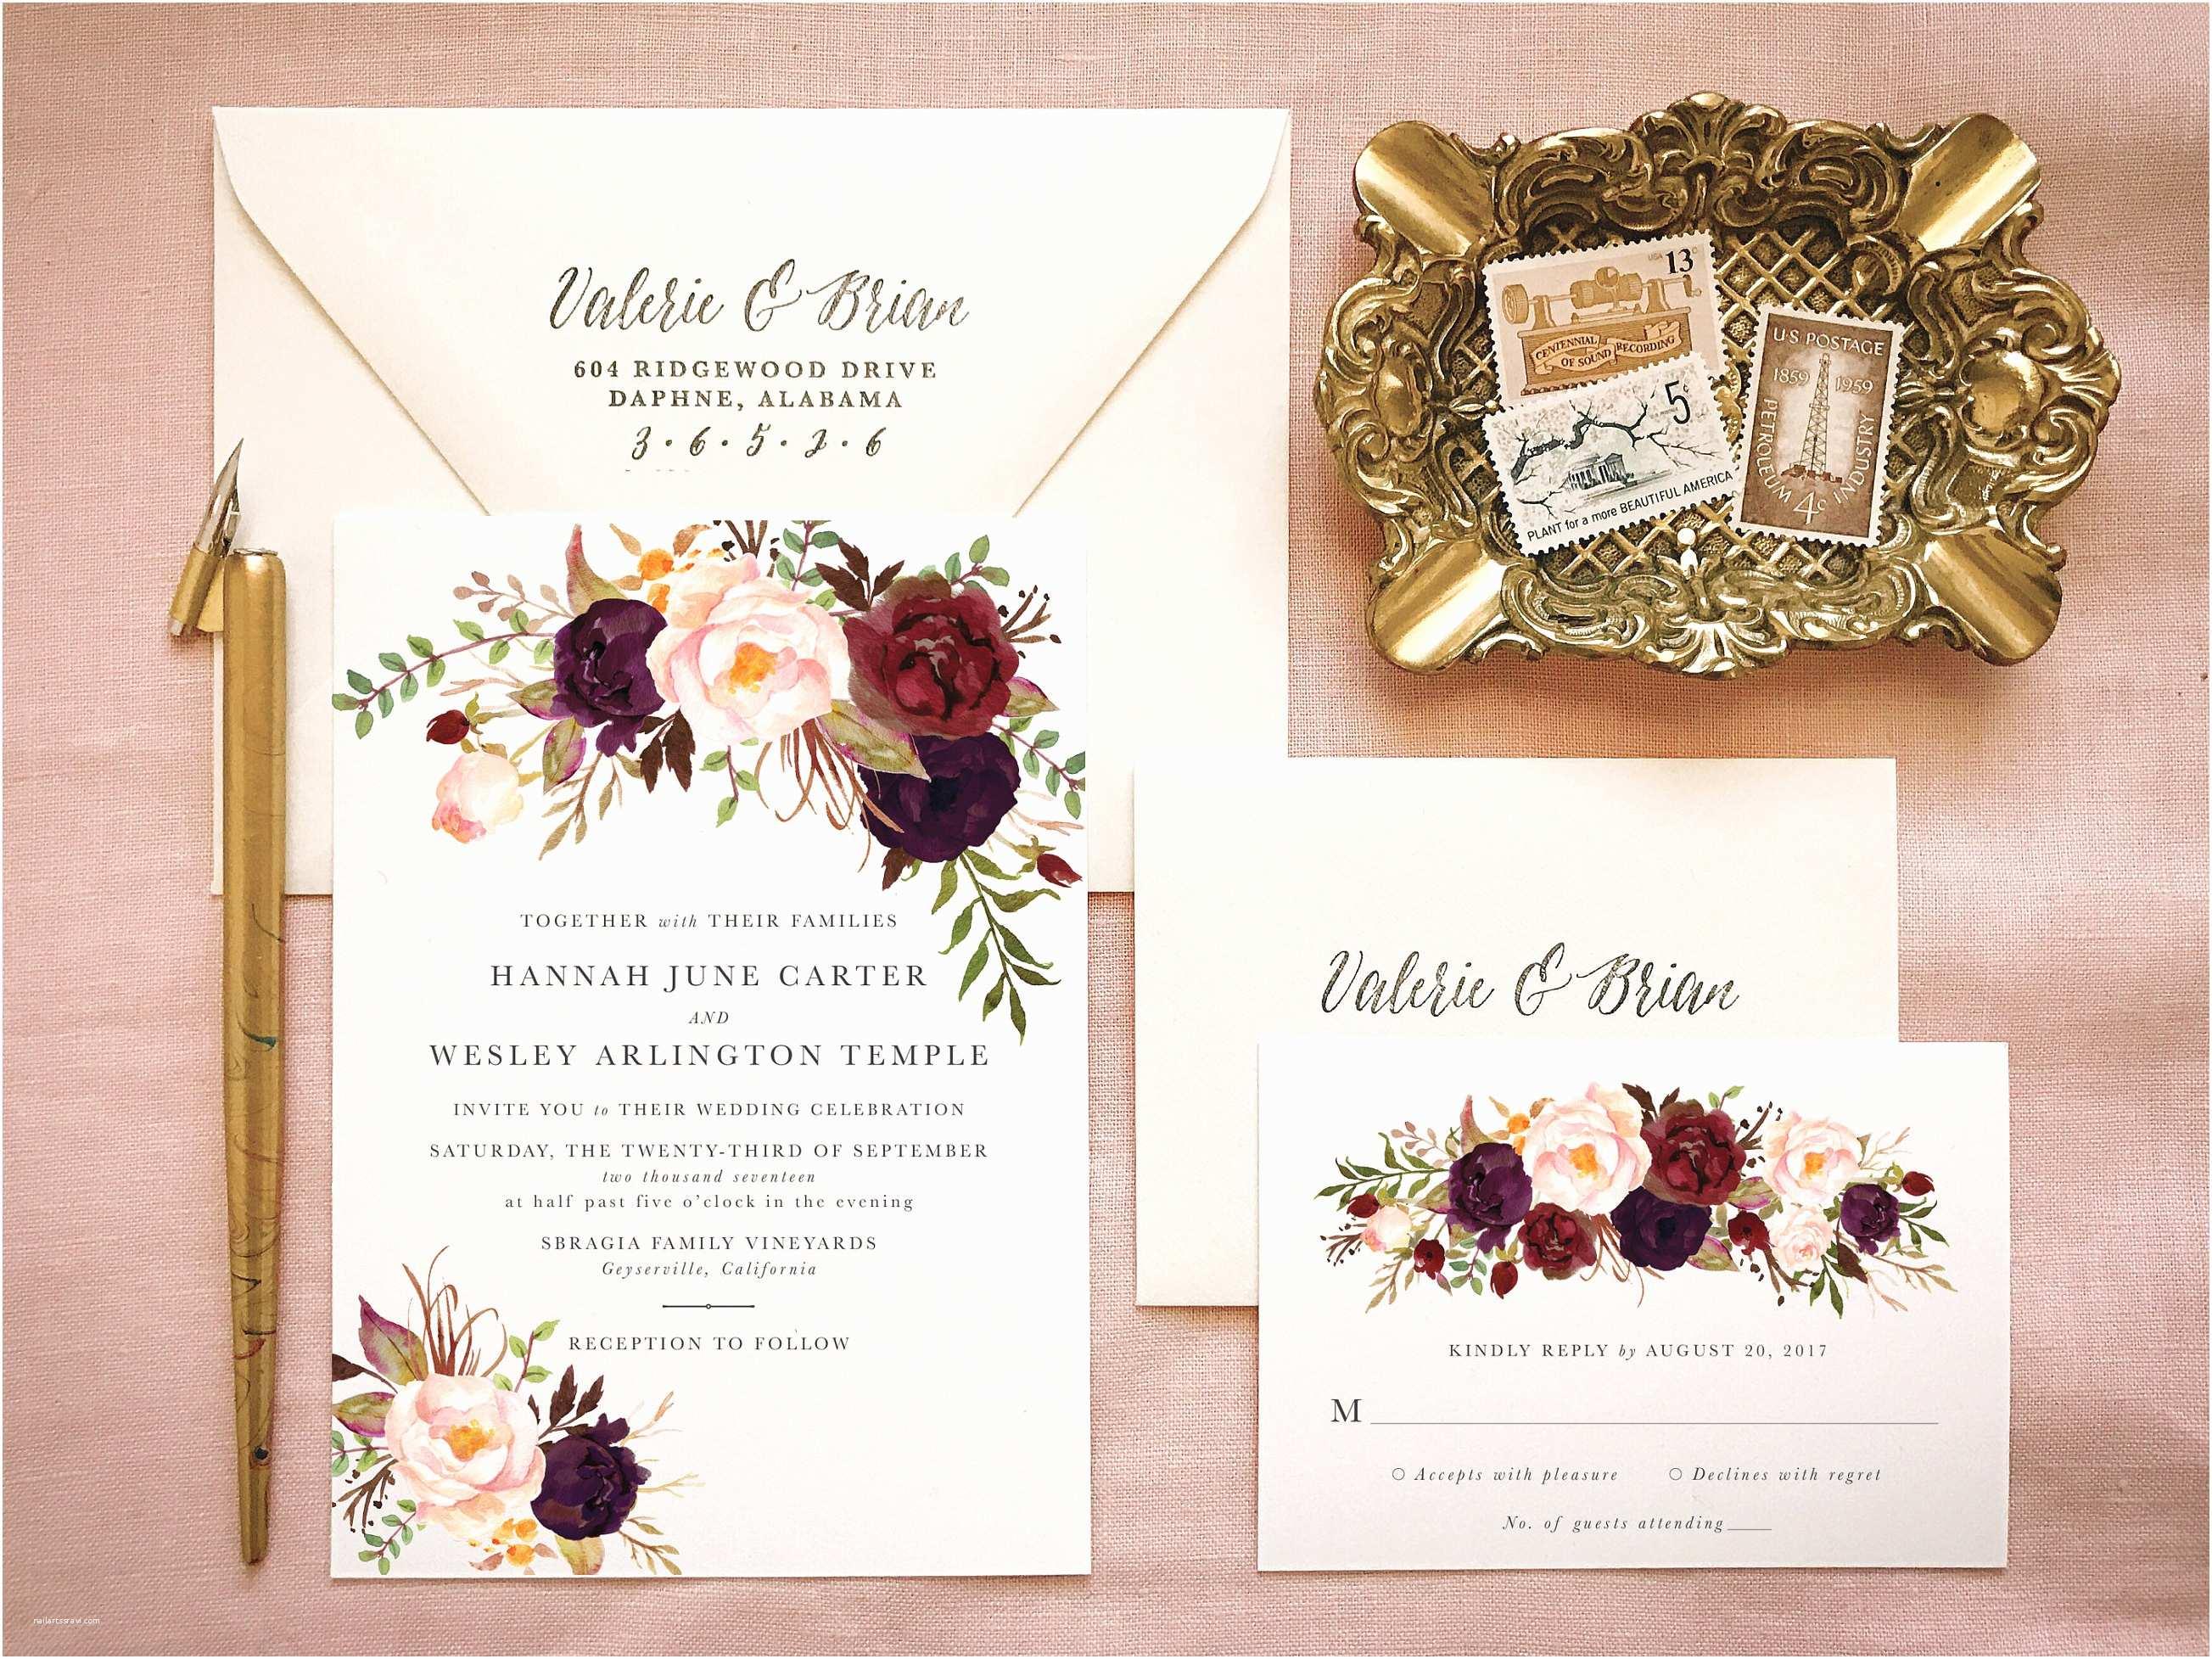 Marsala Wedding Invitations Marsala Wedding Invitation Suite for Bohemian Wedding